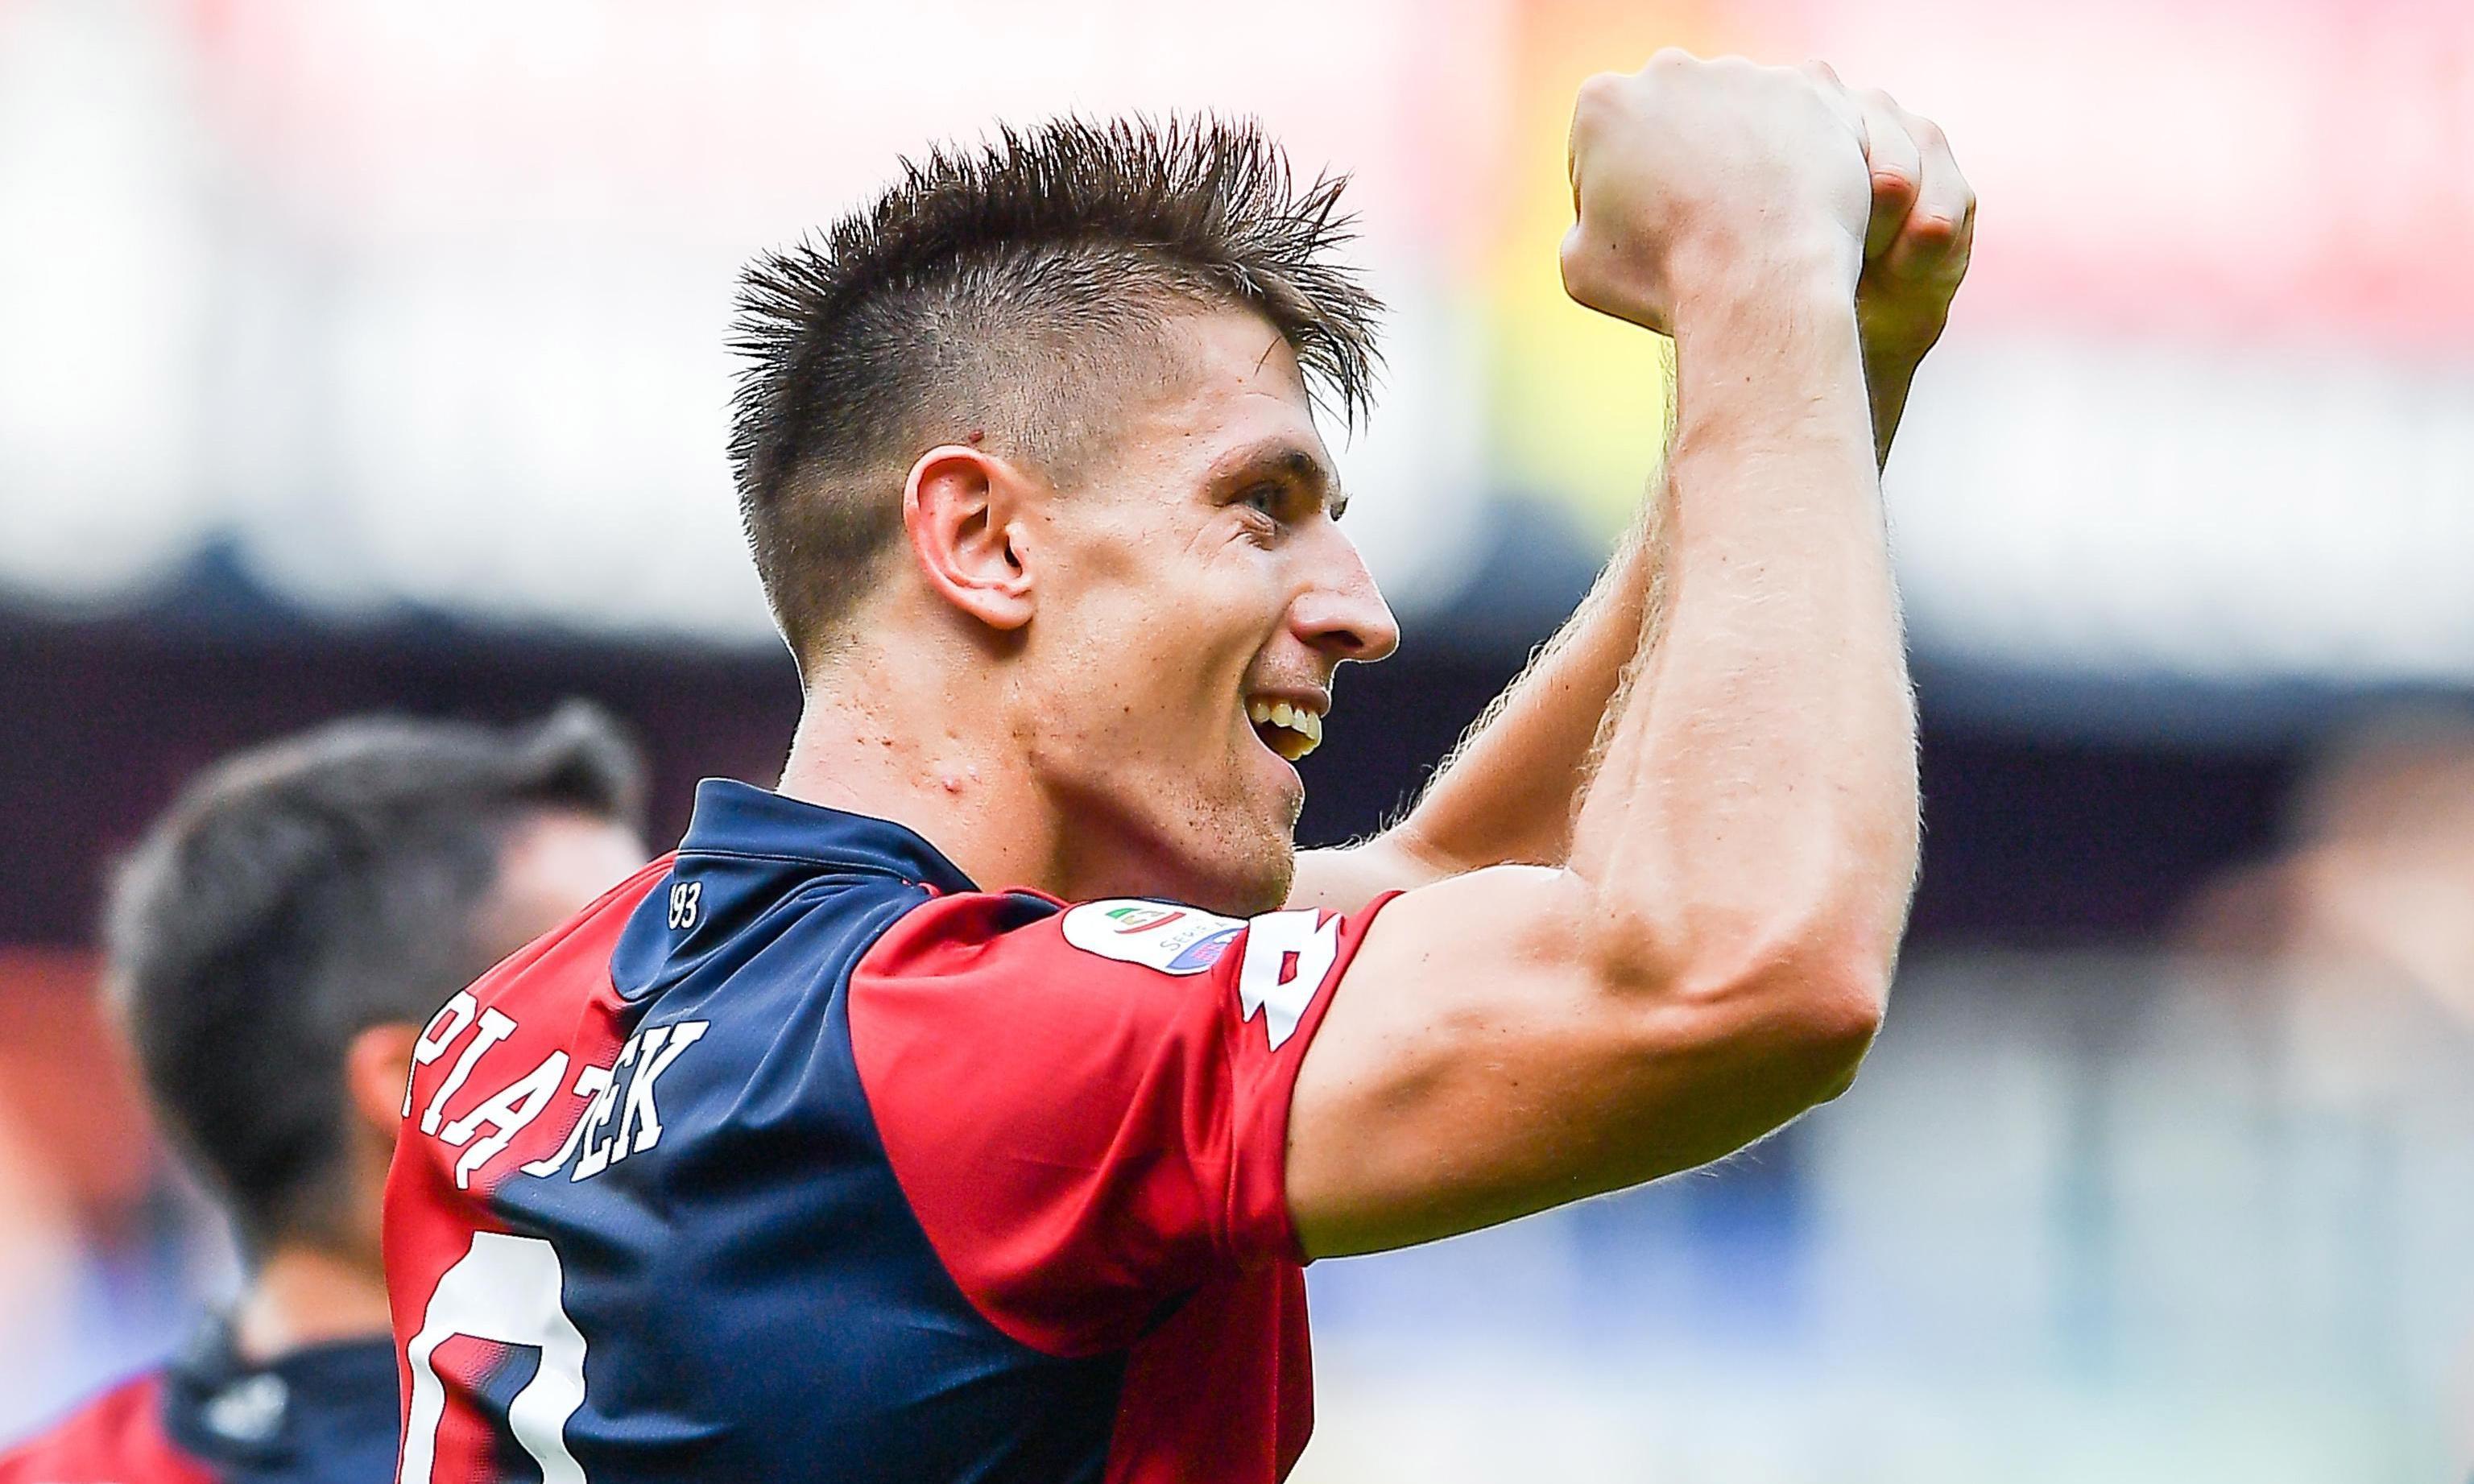 Milan reach agreement to sign Krzysztof Piatek from Genoa for €35m